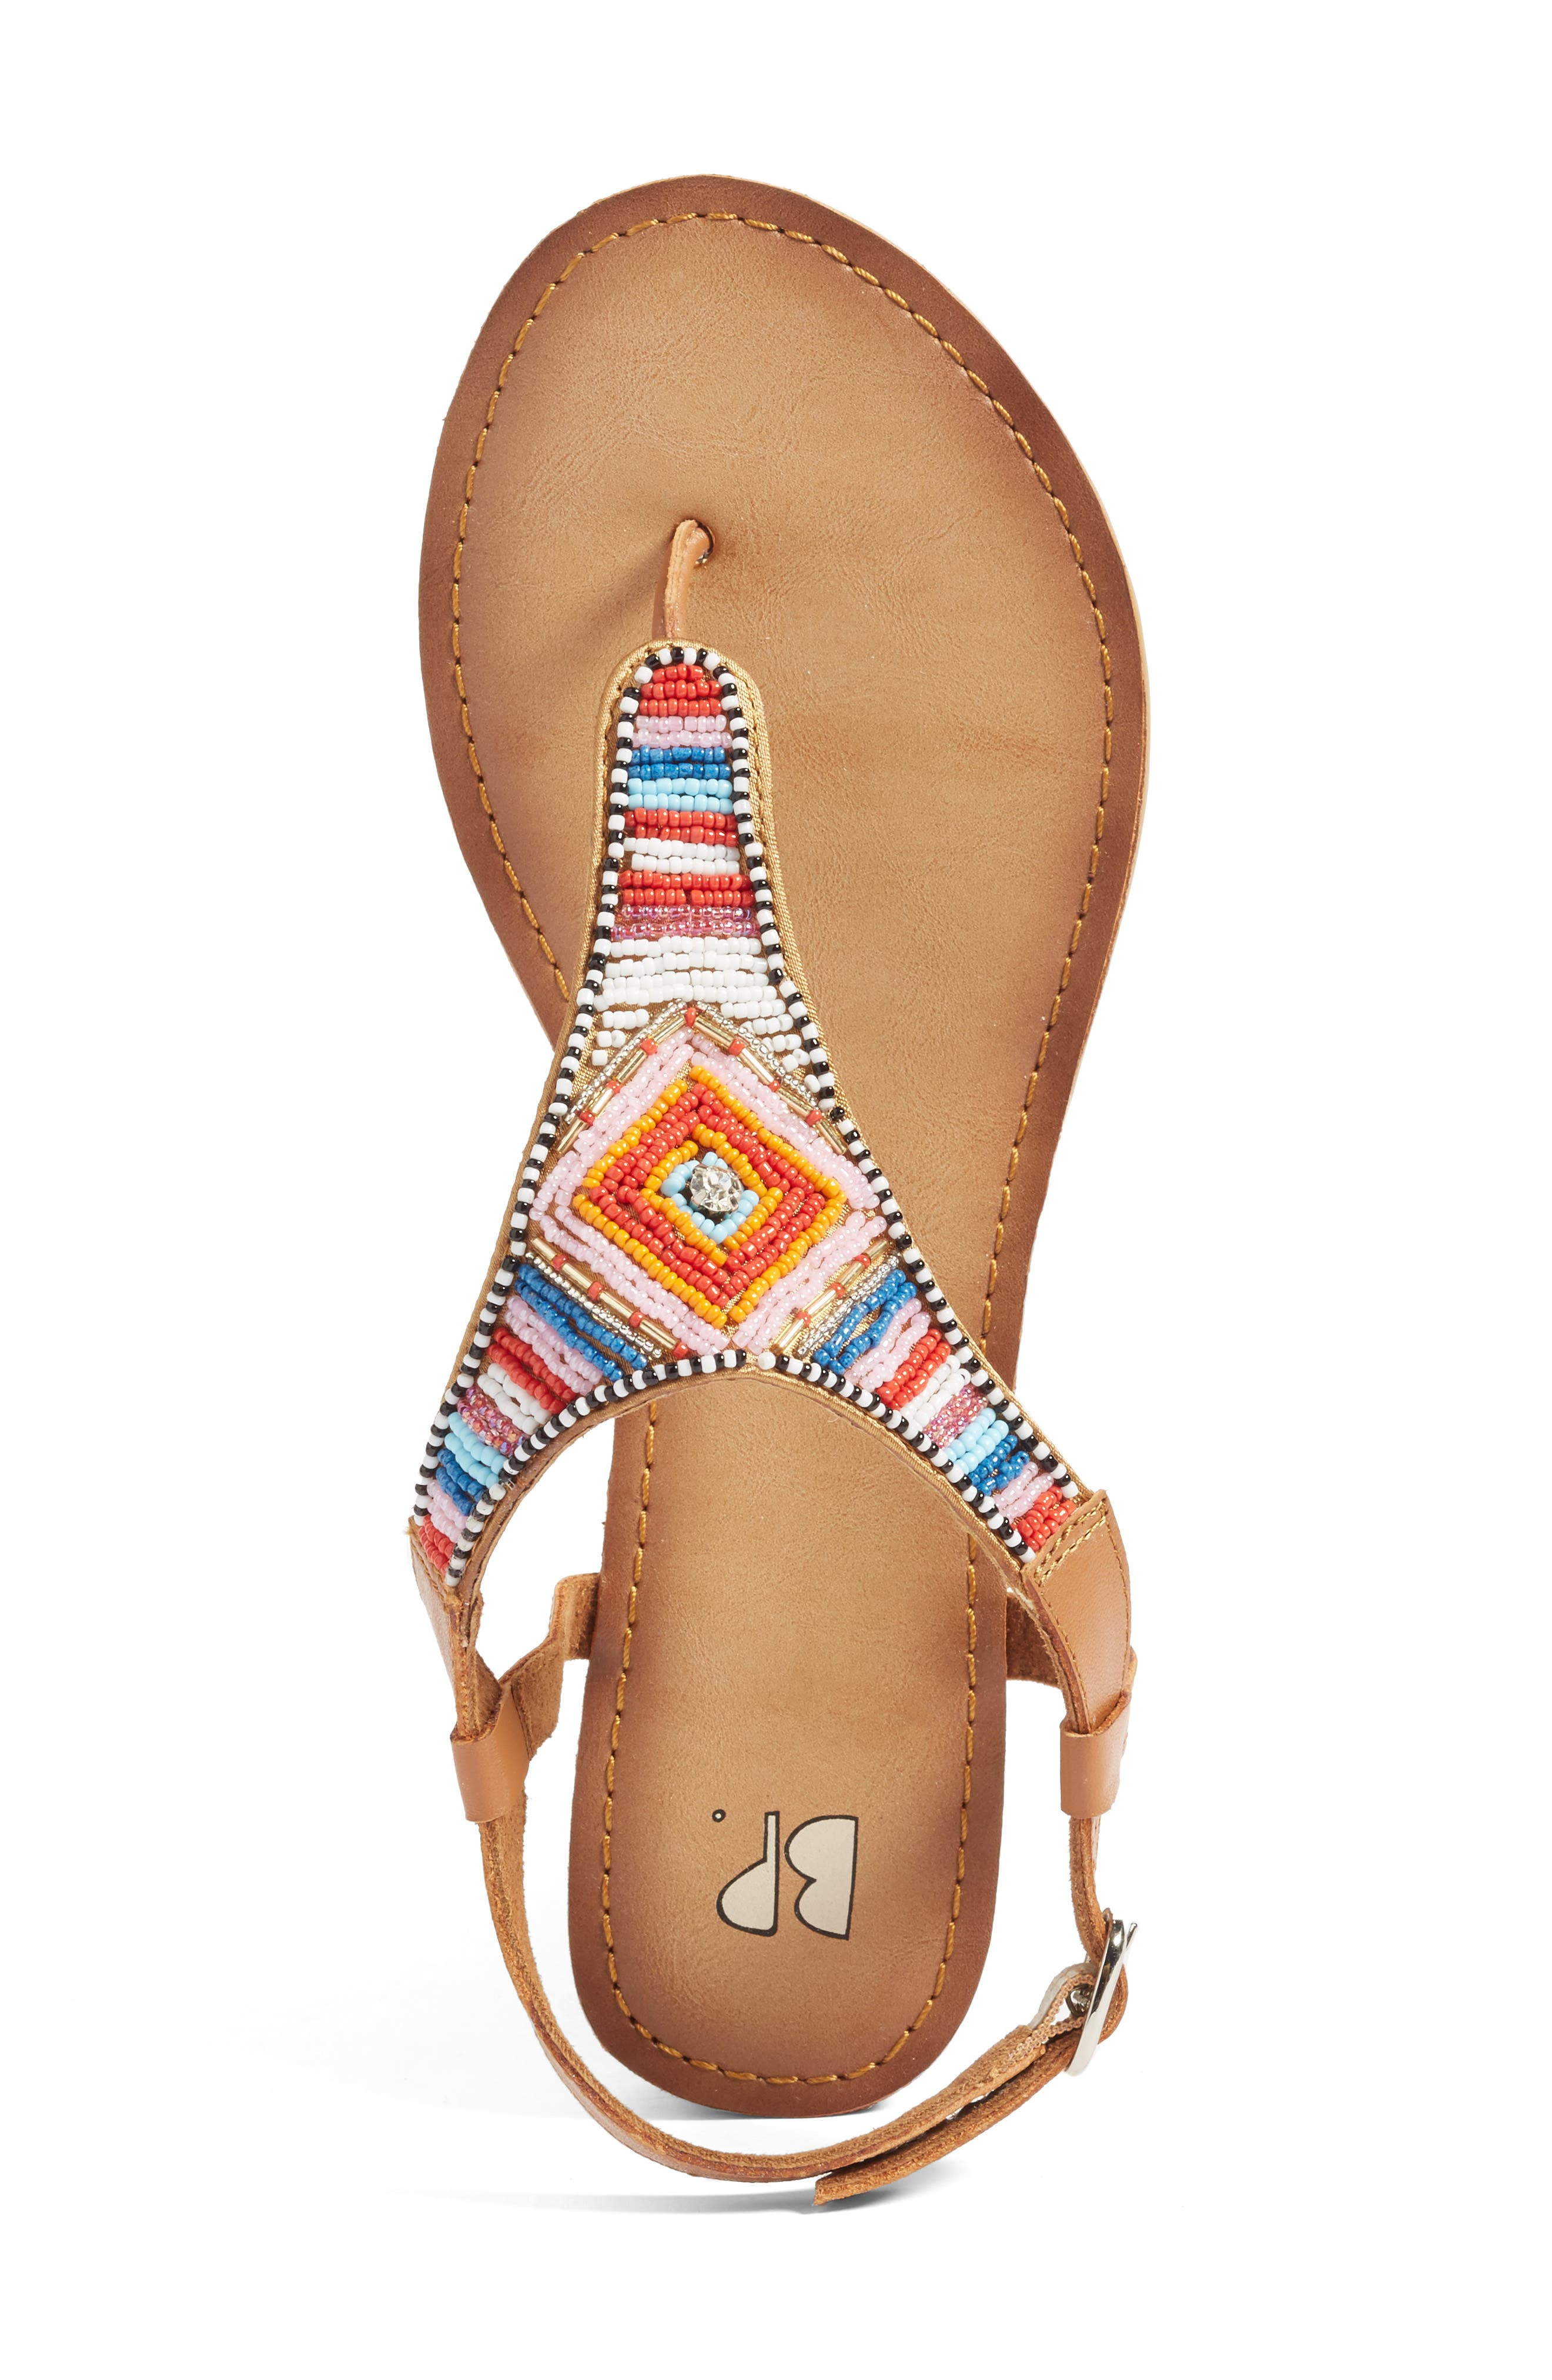 Zandra Beaded V-Strap Sandal,                             Alternate thumbnail 3, color,                             200